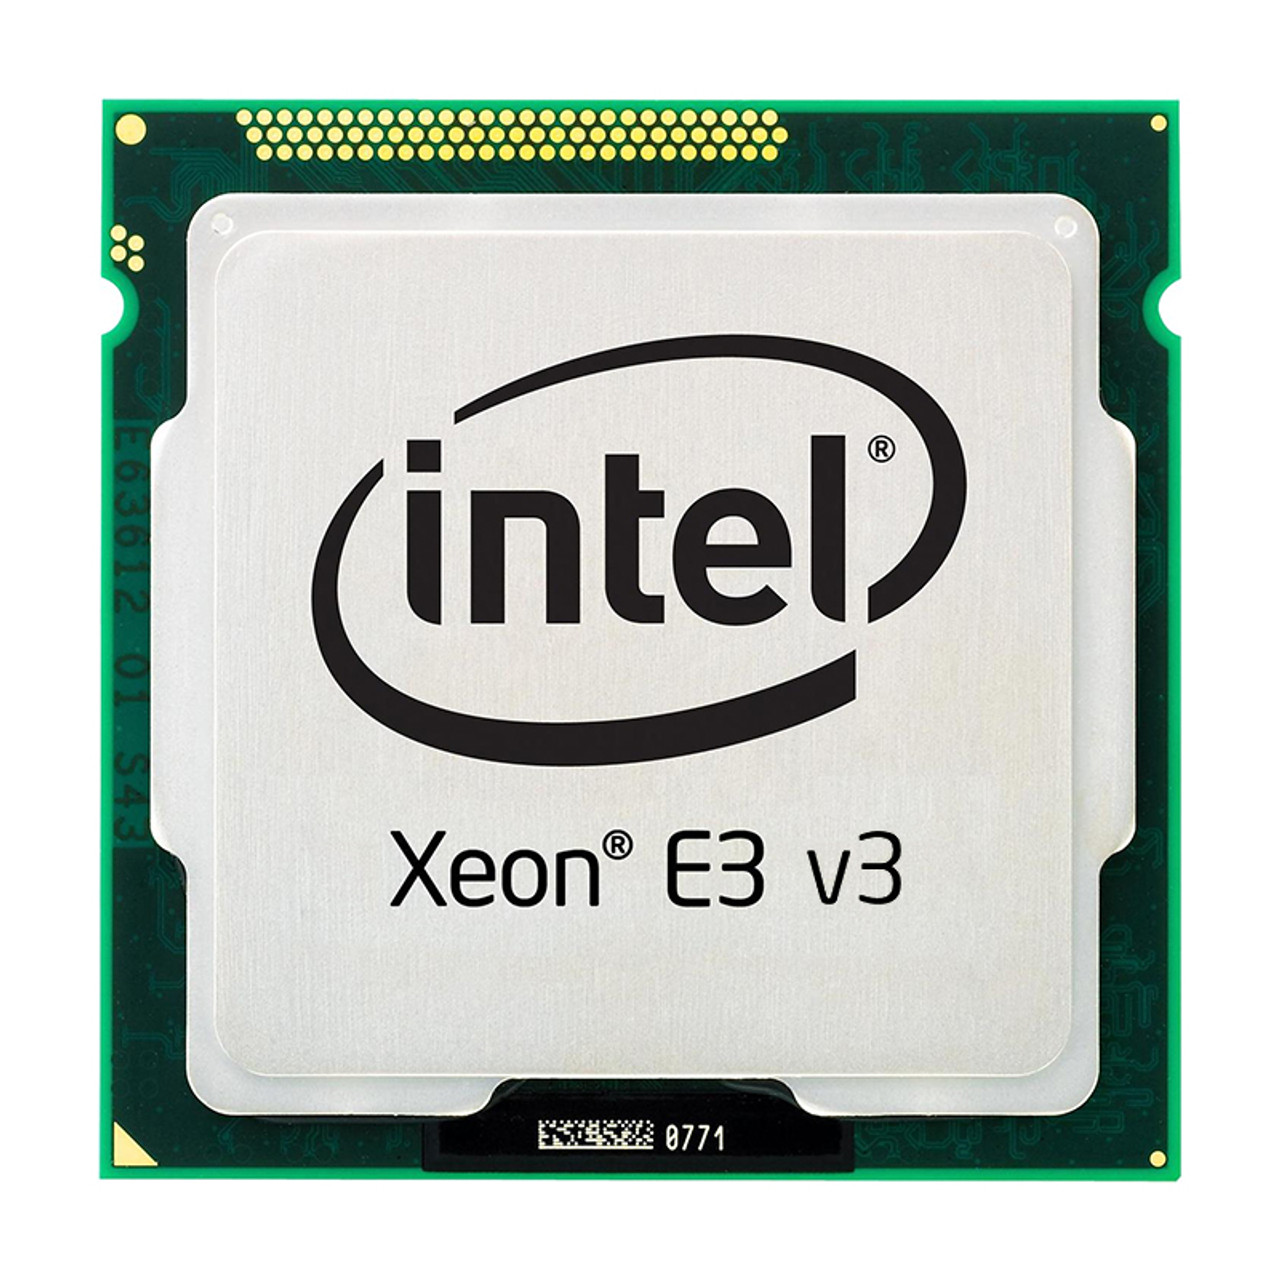 intel E3-1285L V3 E3-1285L V4 E3-1290 E3-1290 V2 CPU Processor